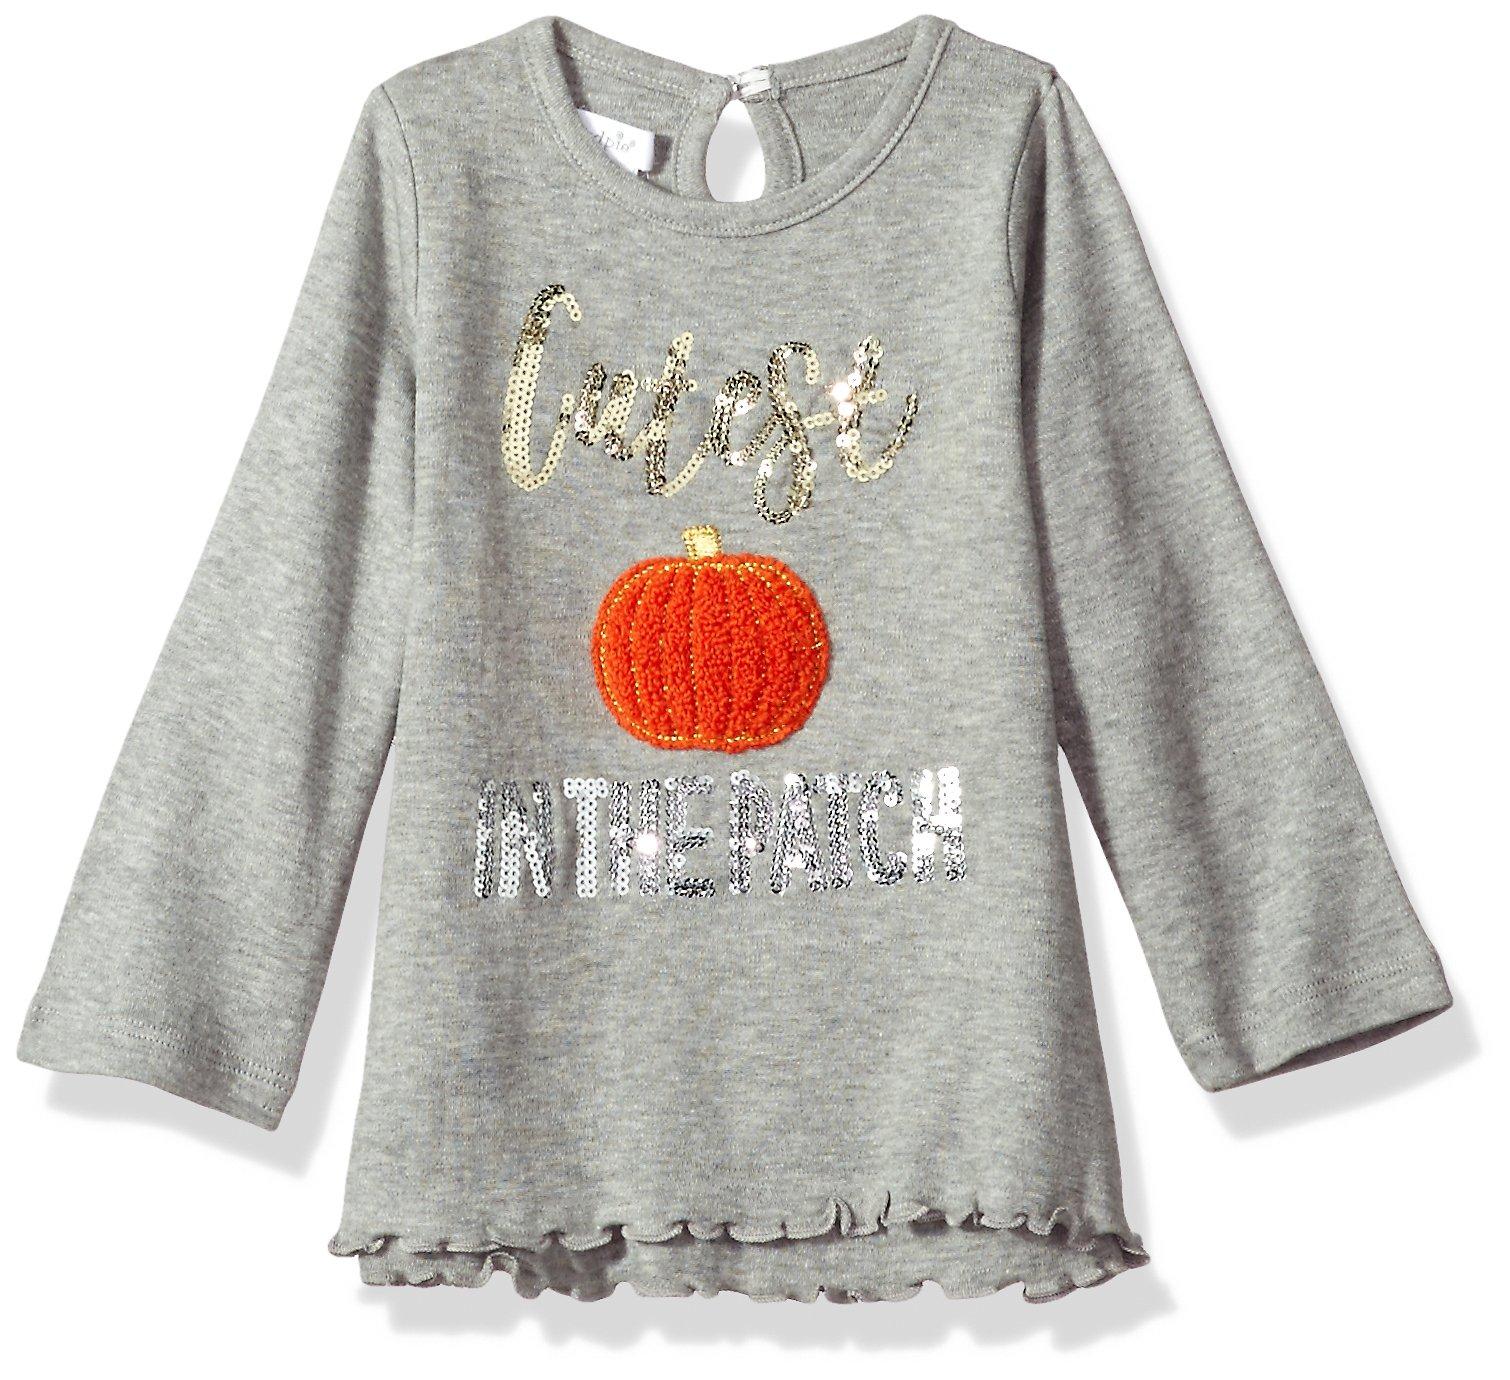 Mud Pie Baby Toddler Girls' Halloween Long Sleeve